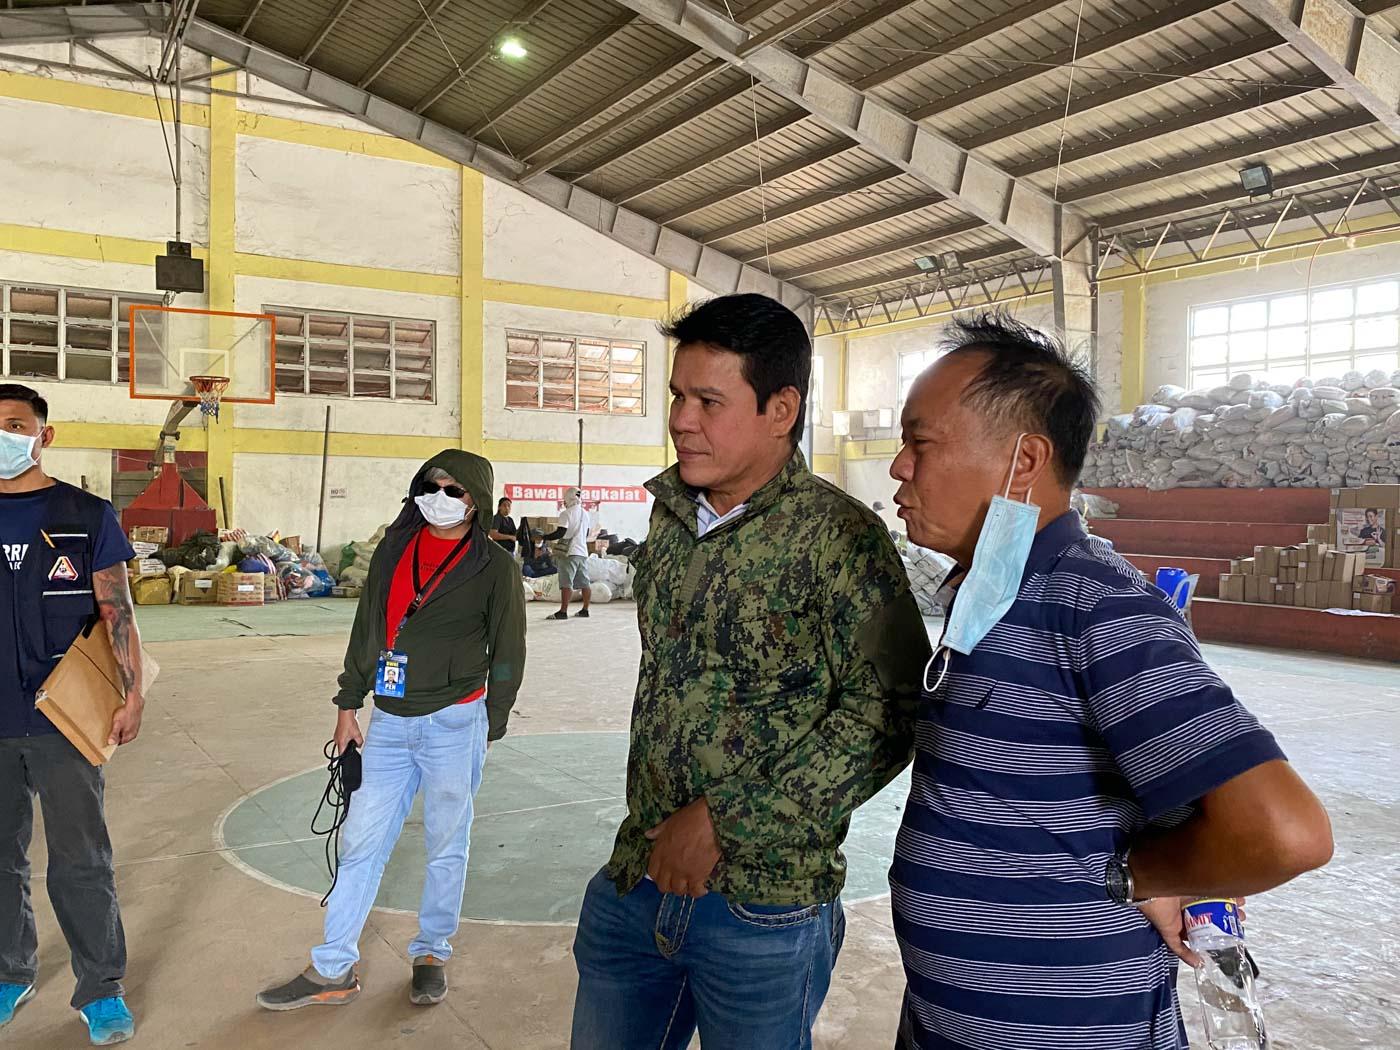 THE MAYOR. Talisay Mayor Gerry Natanauan oversees the arrival of relief goods from Nueva Ecija on January 31, 2020. Photo by Mara Cepeda/Rappler